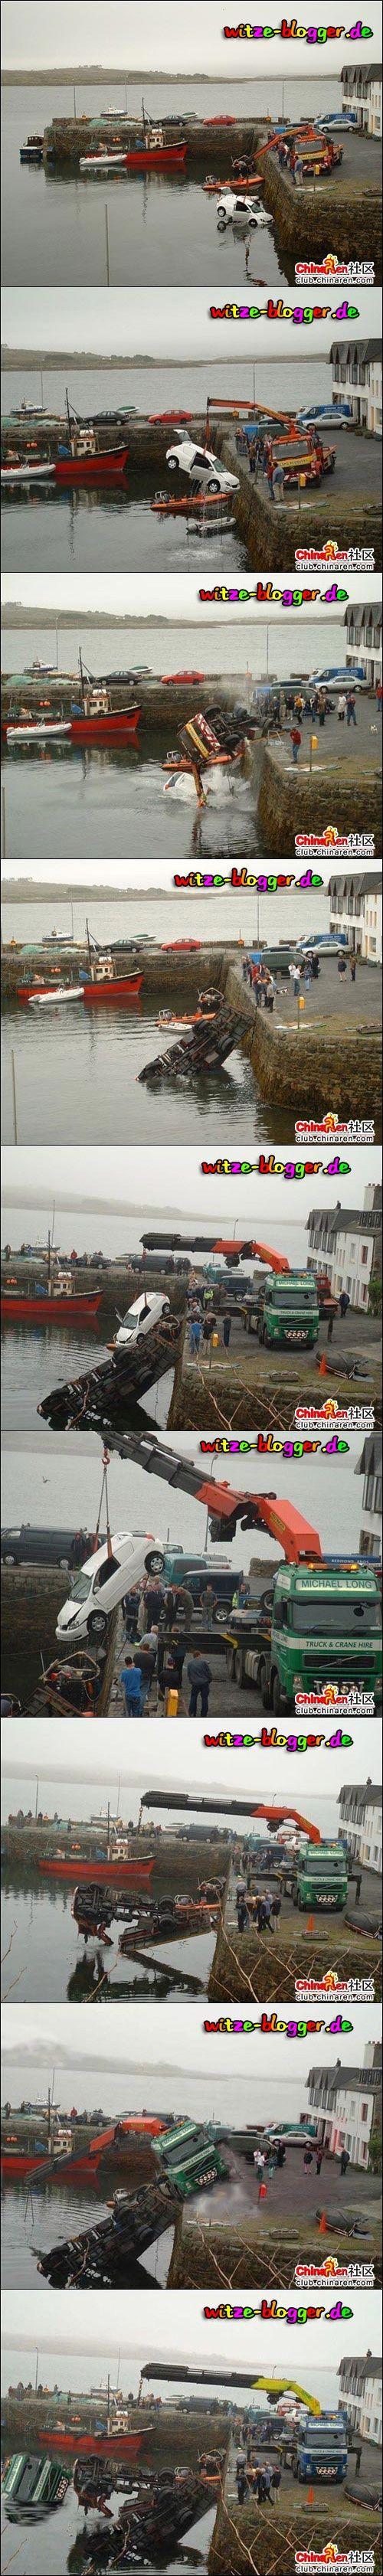 crazy crane accidents... .@Jorge Martinez Cavalcante (JORGENCA)